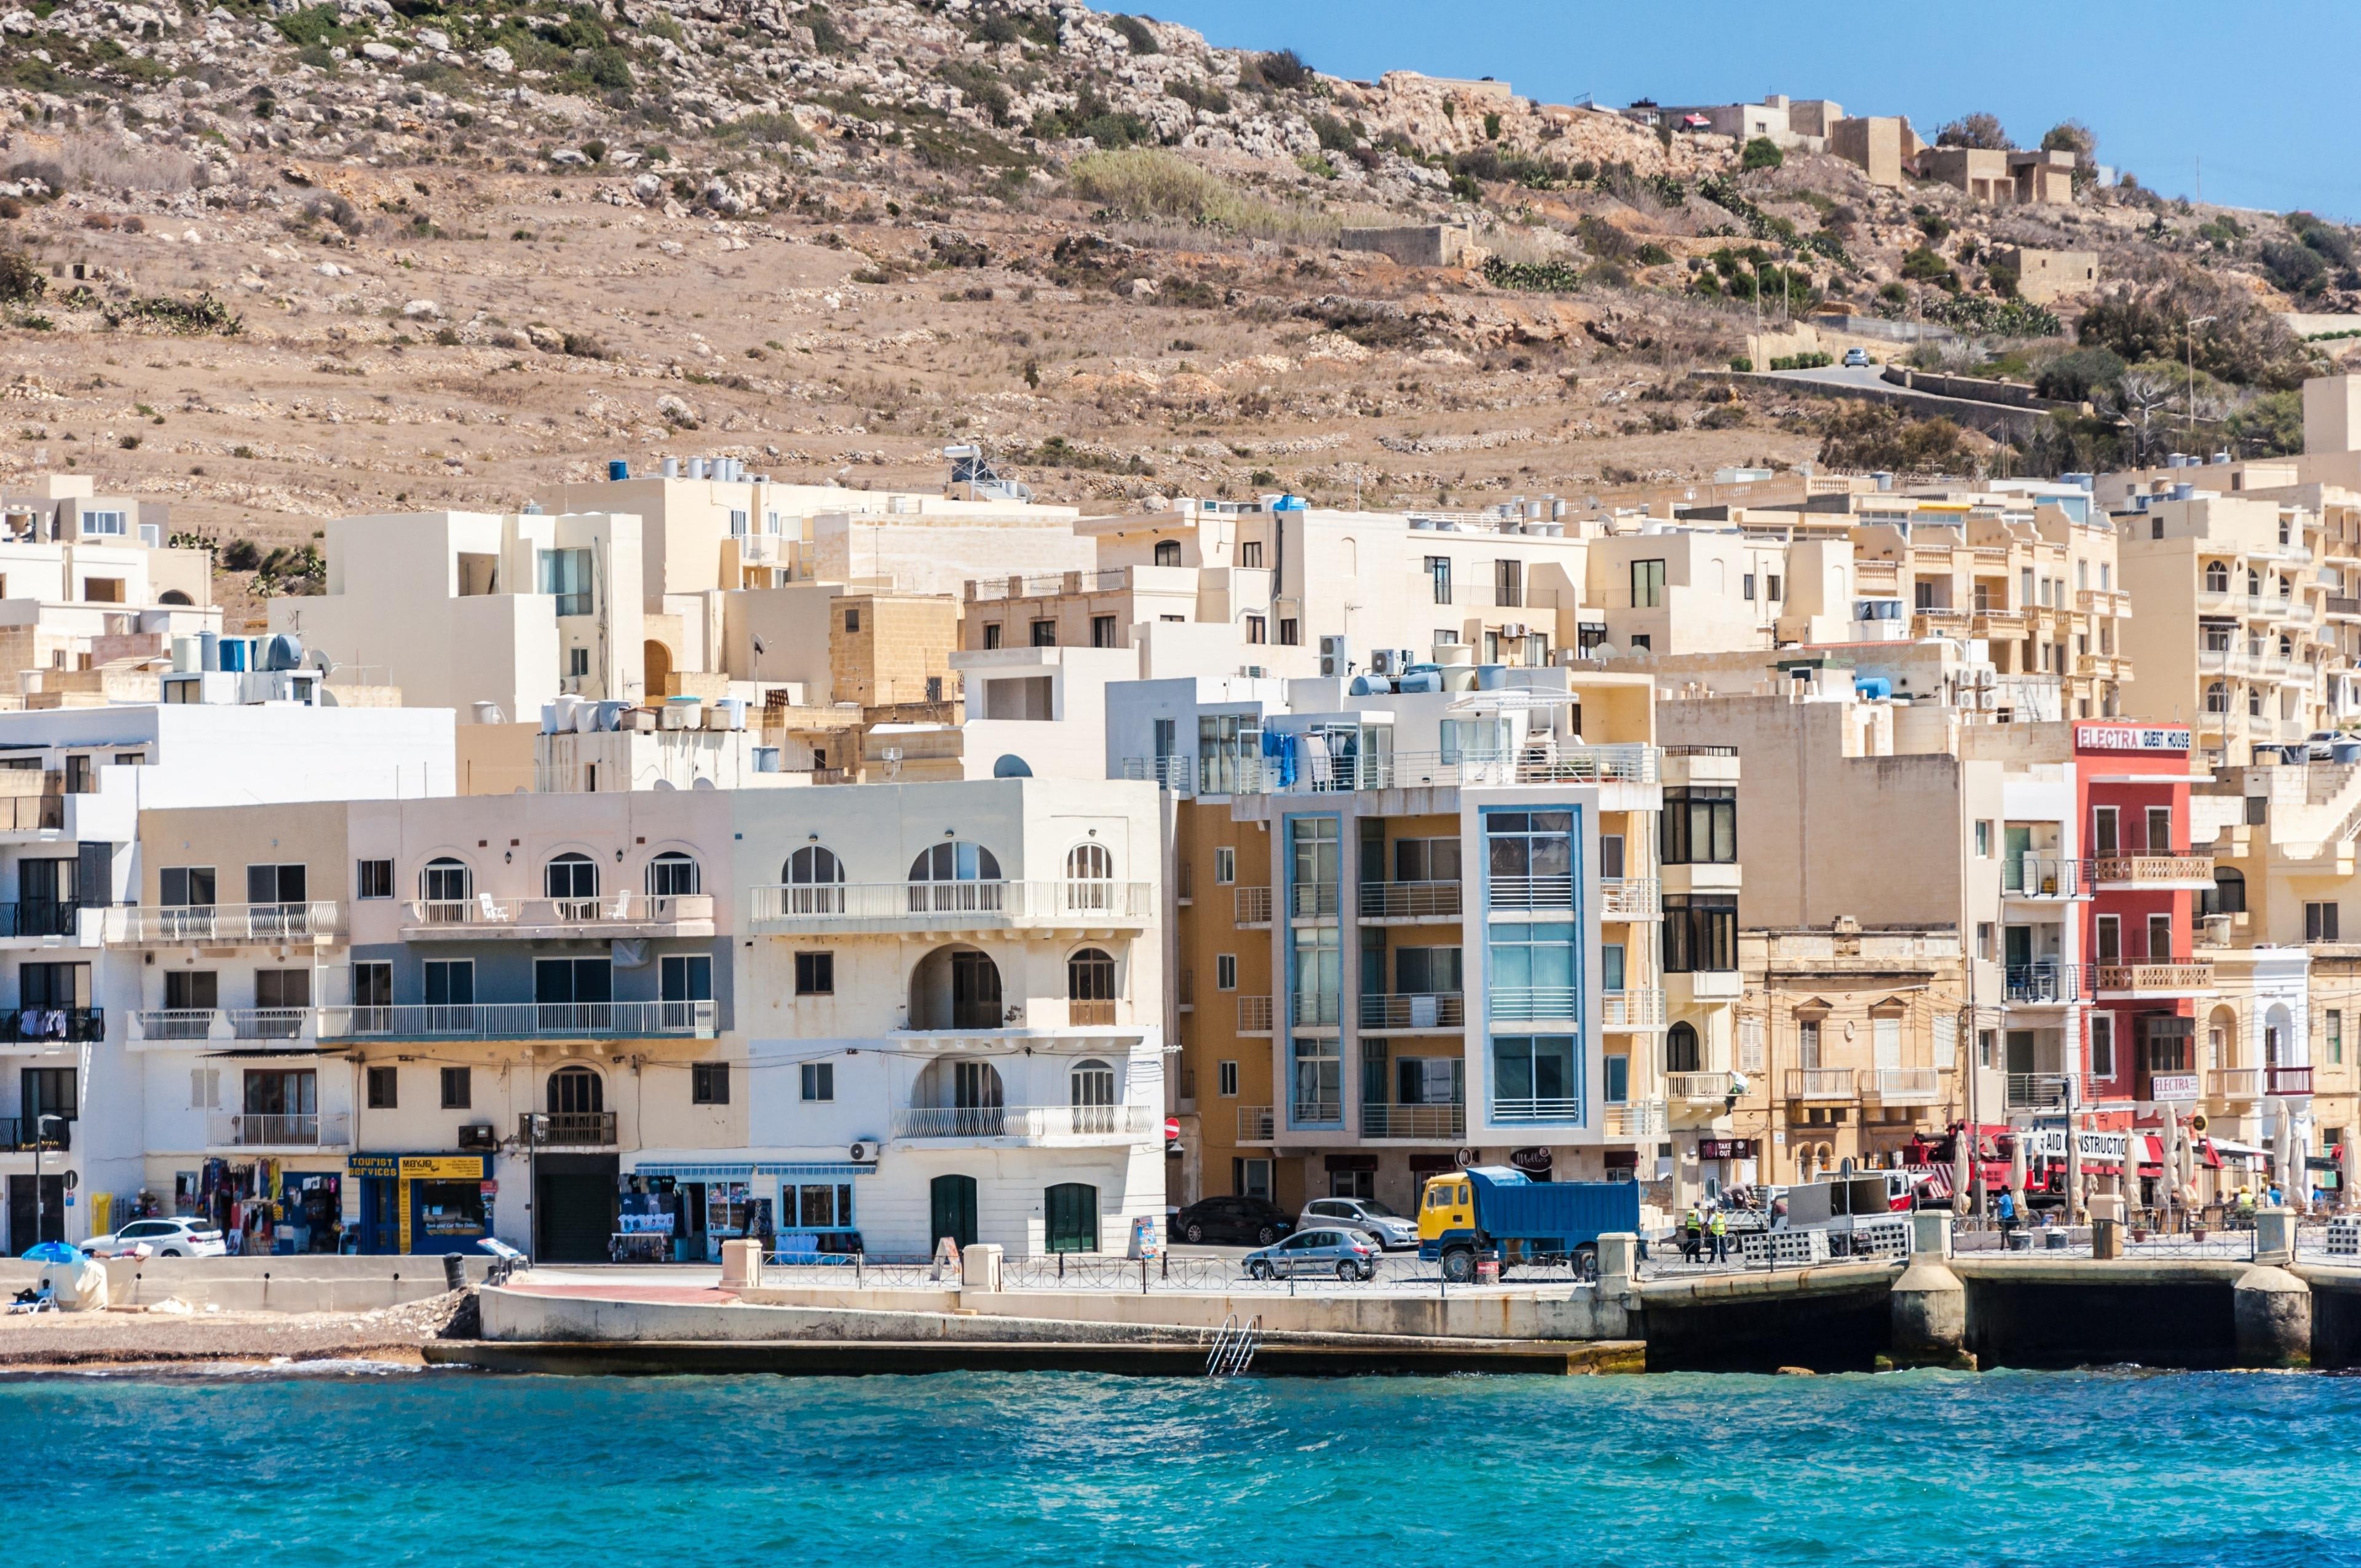 Marsalforn, Zebbug, Gozo Region, Malta